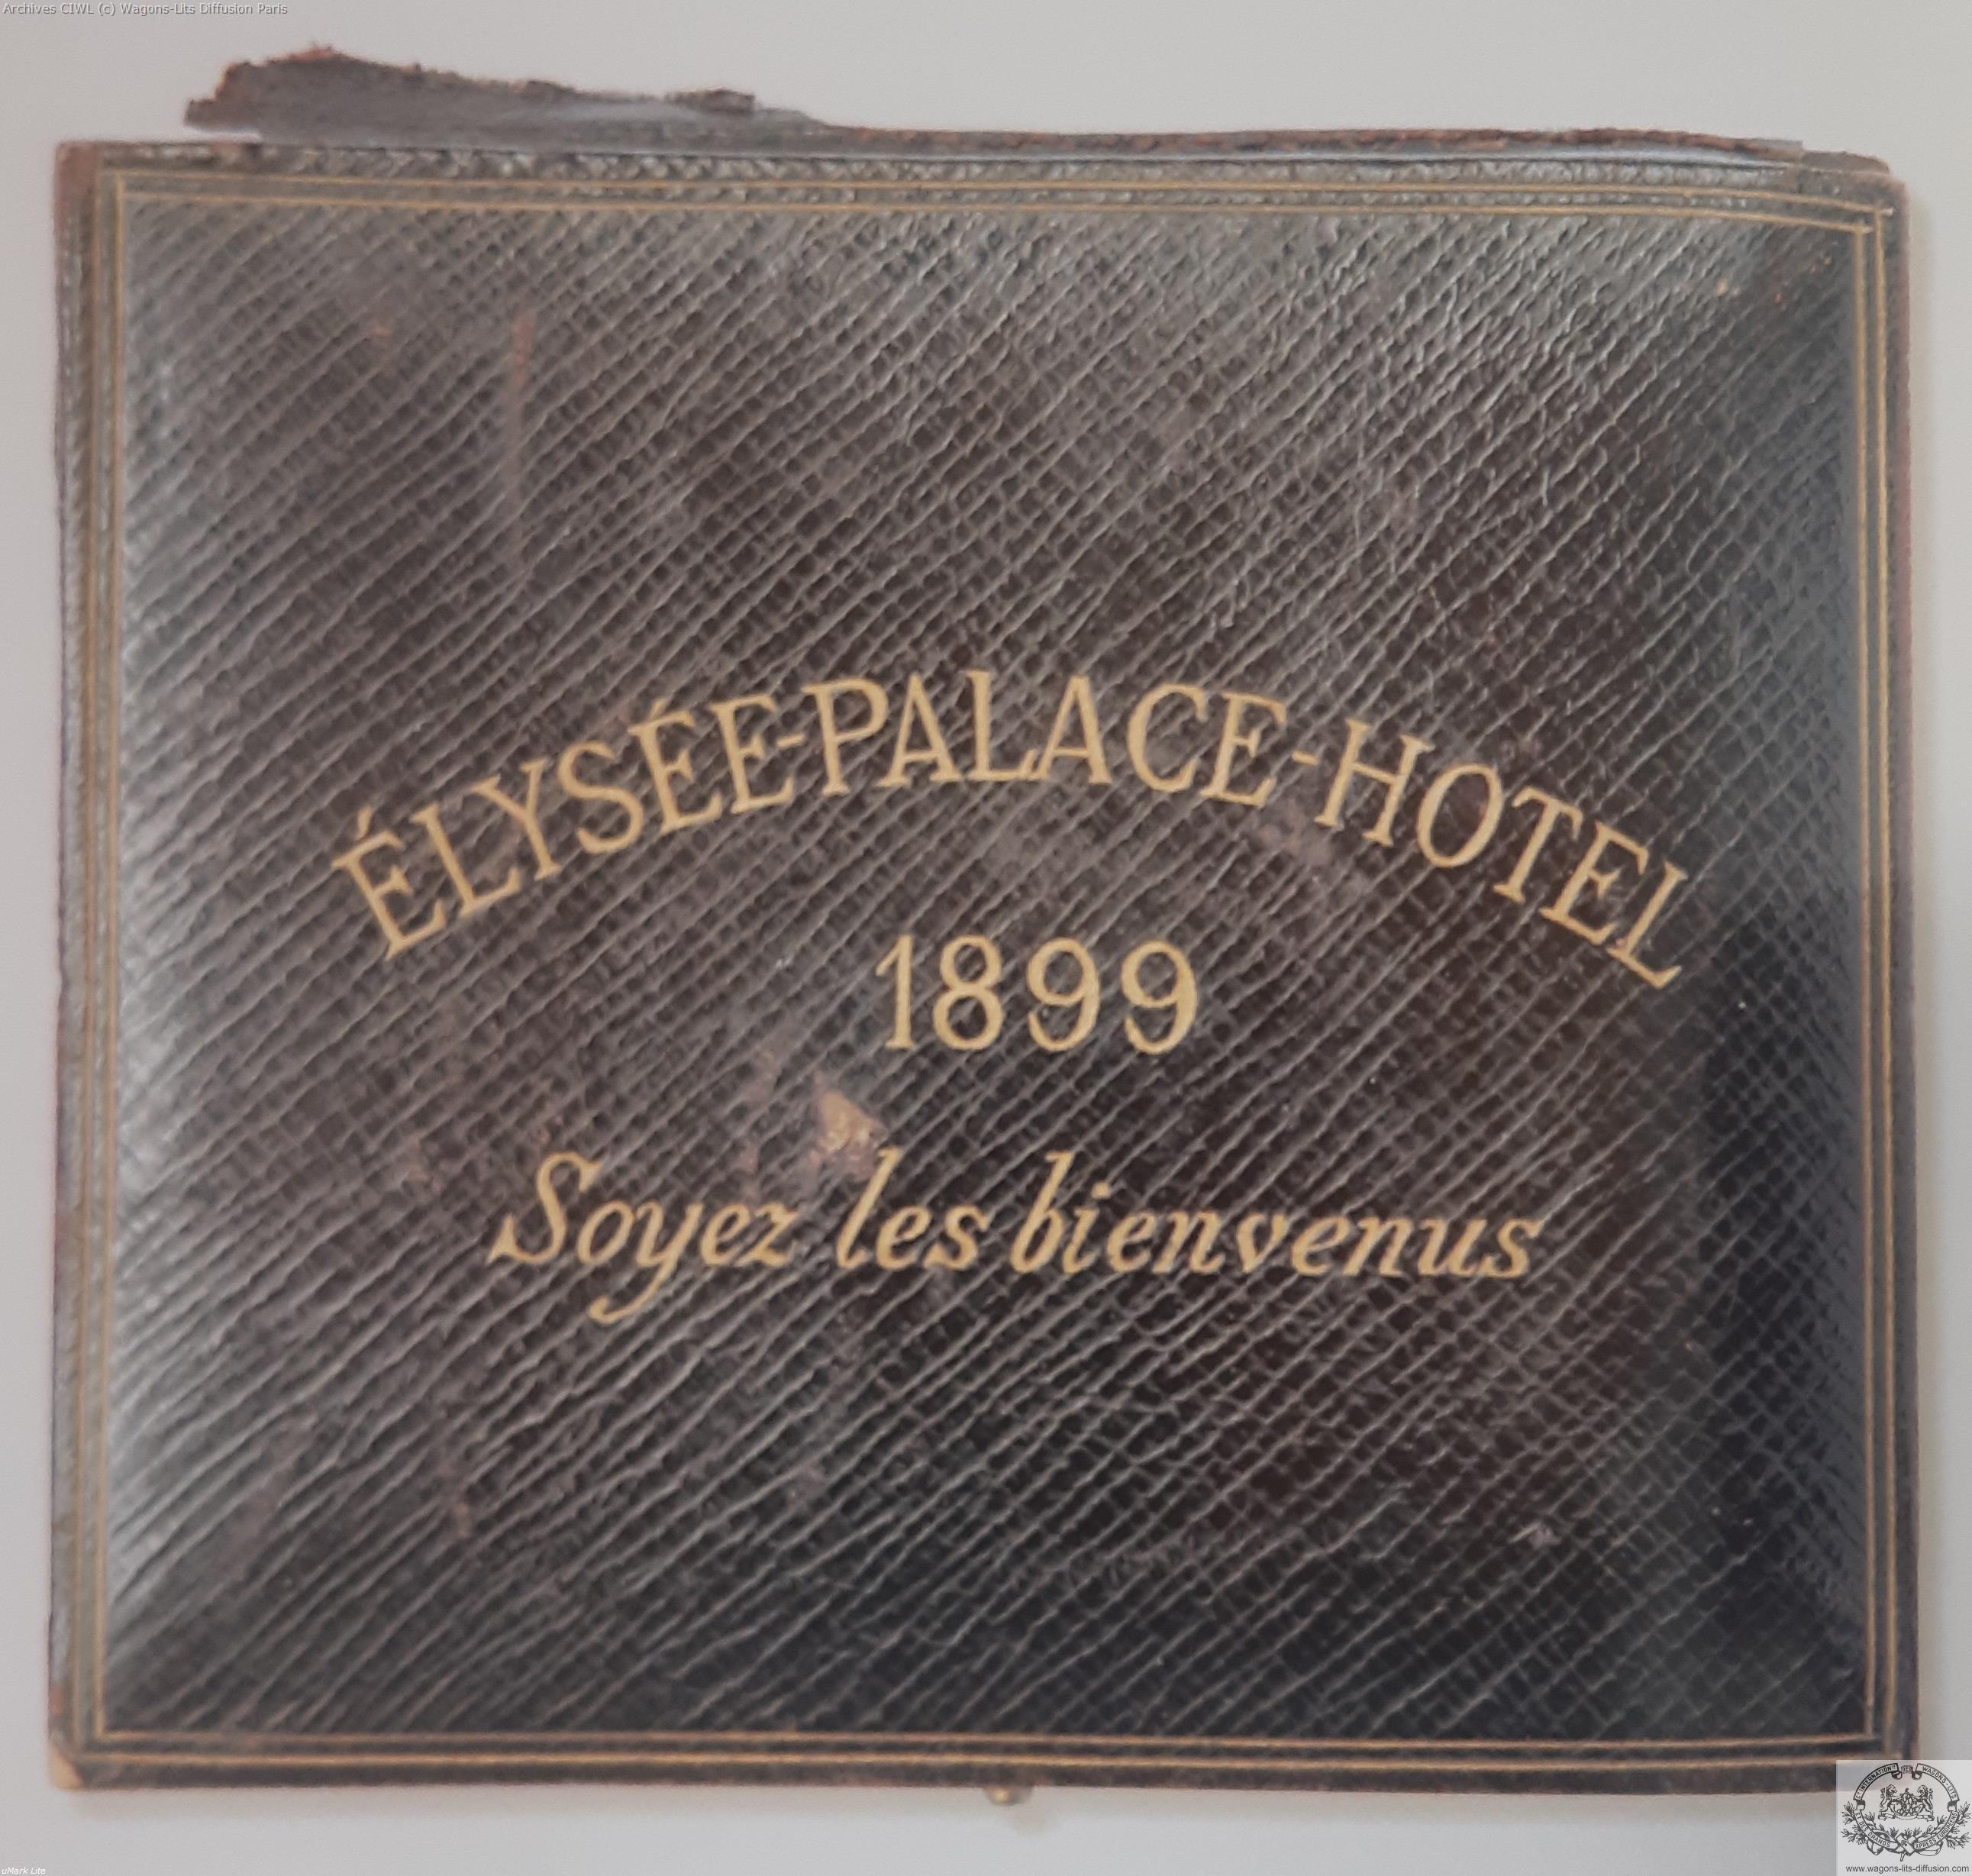 Wl elysees palace hotel paris 1899 gift